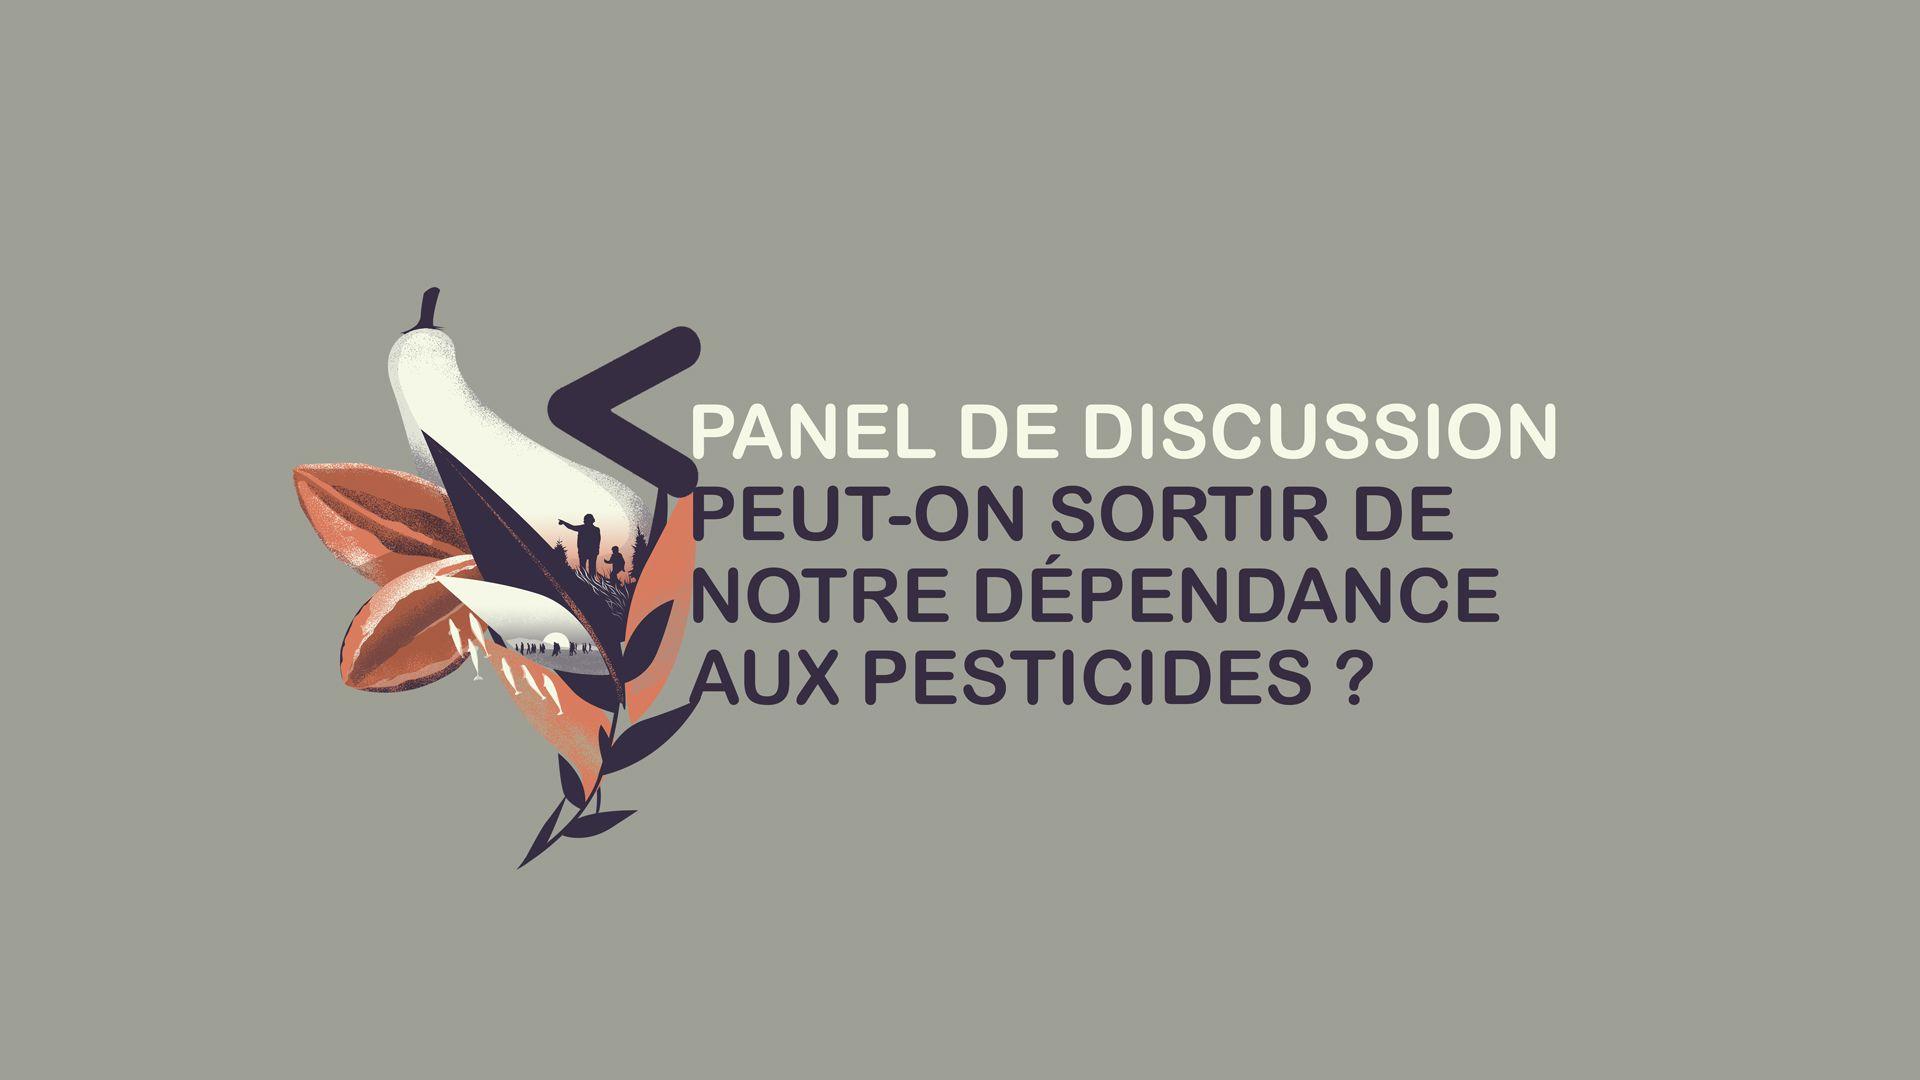 PANEL_DE_DISCUSSION.jpg